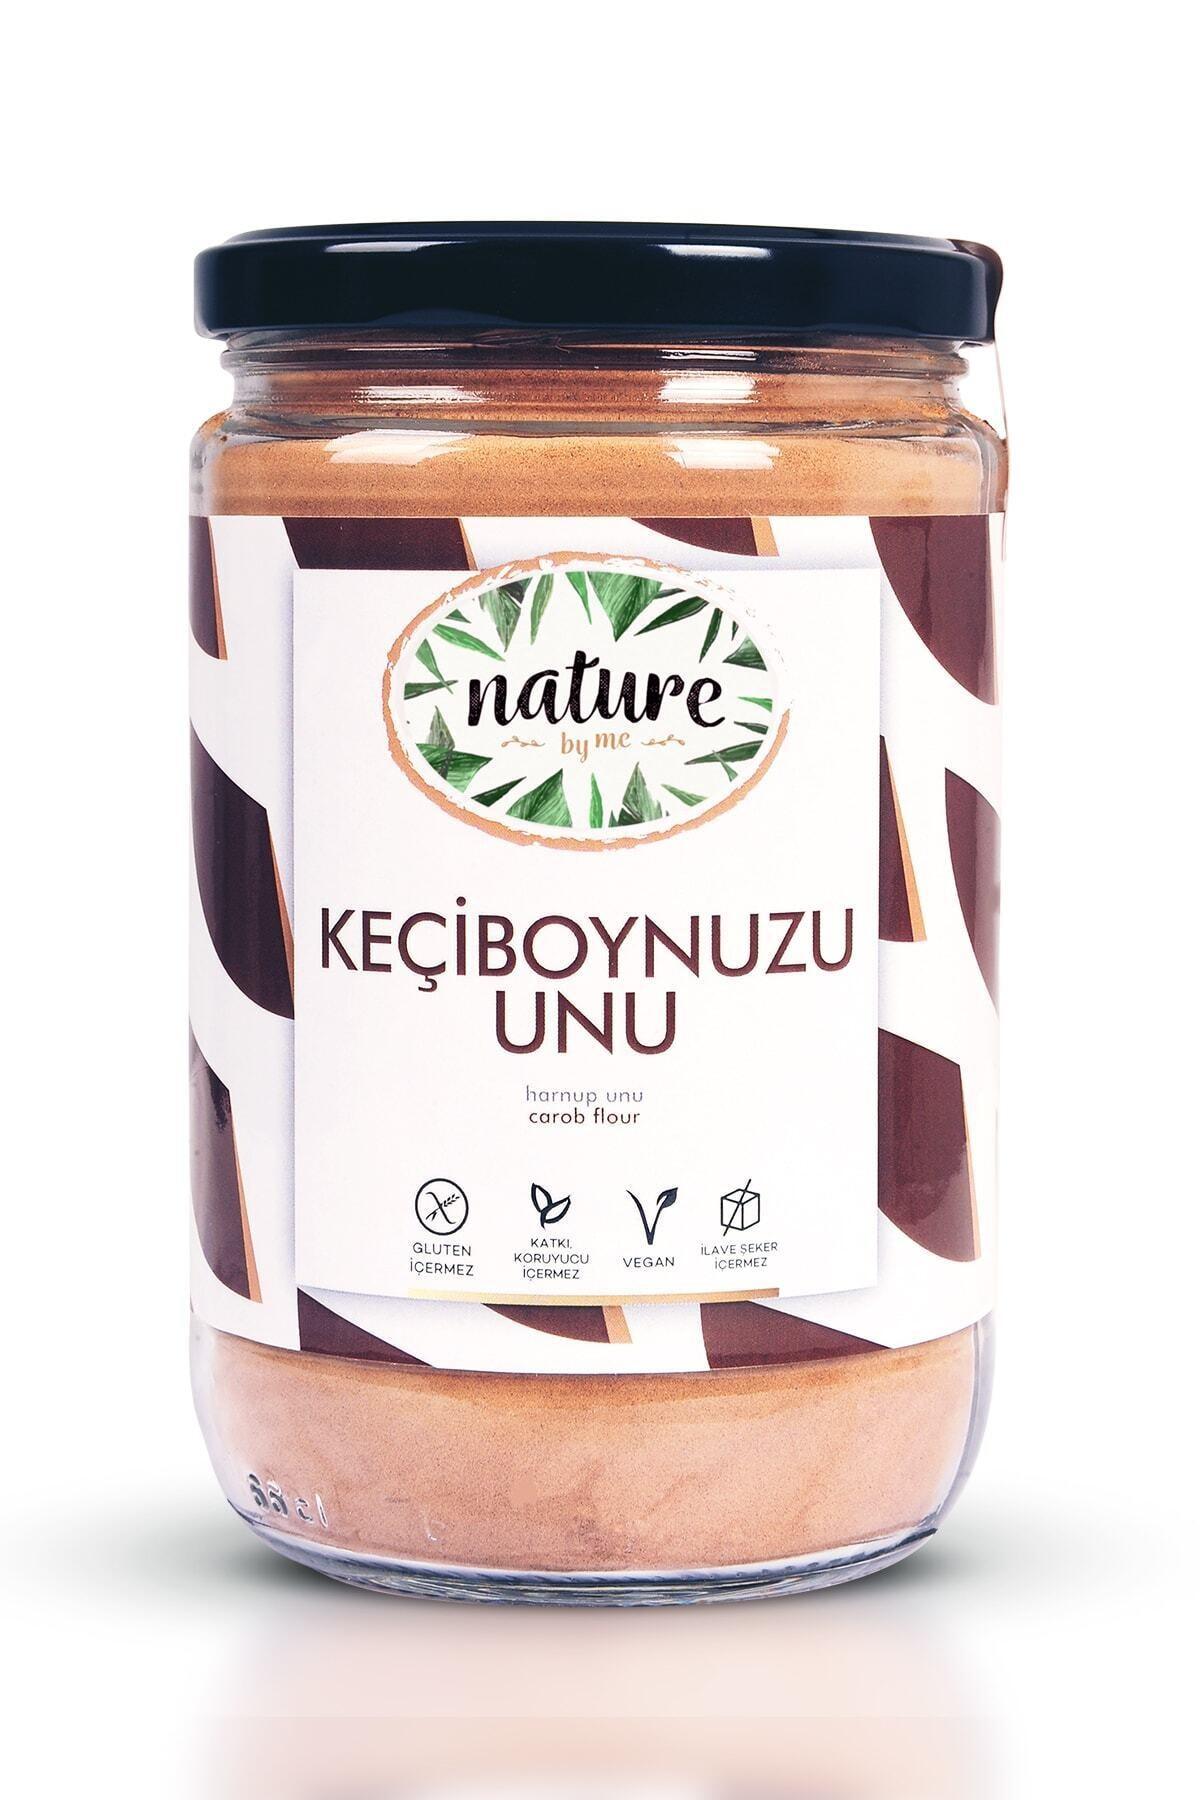 Nature by me Keçiboynuzu Unu 300g